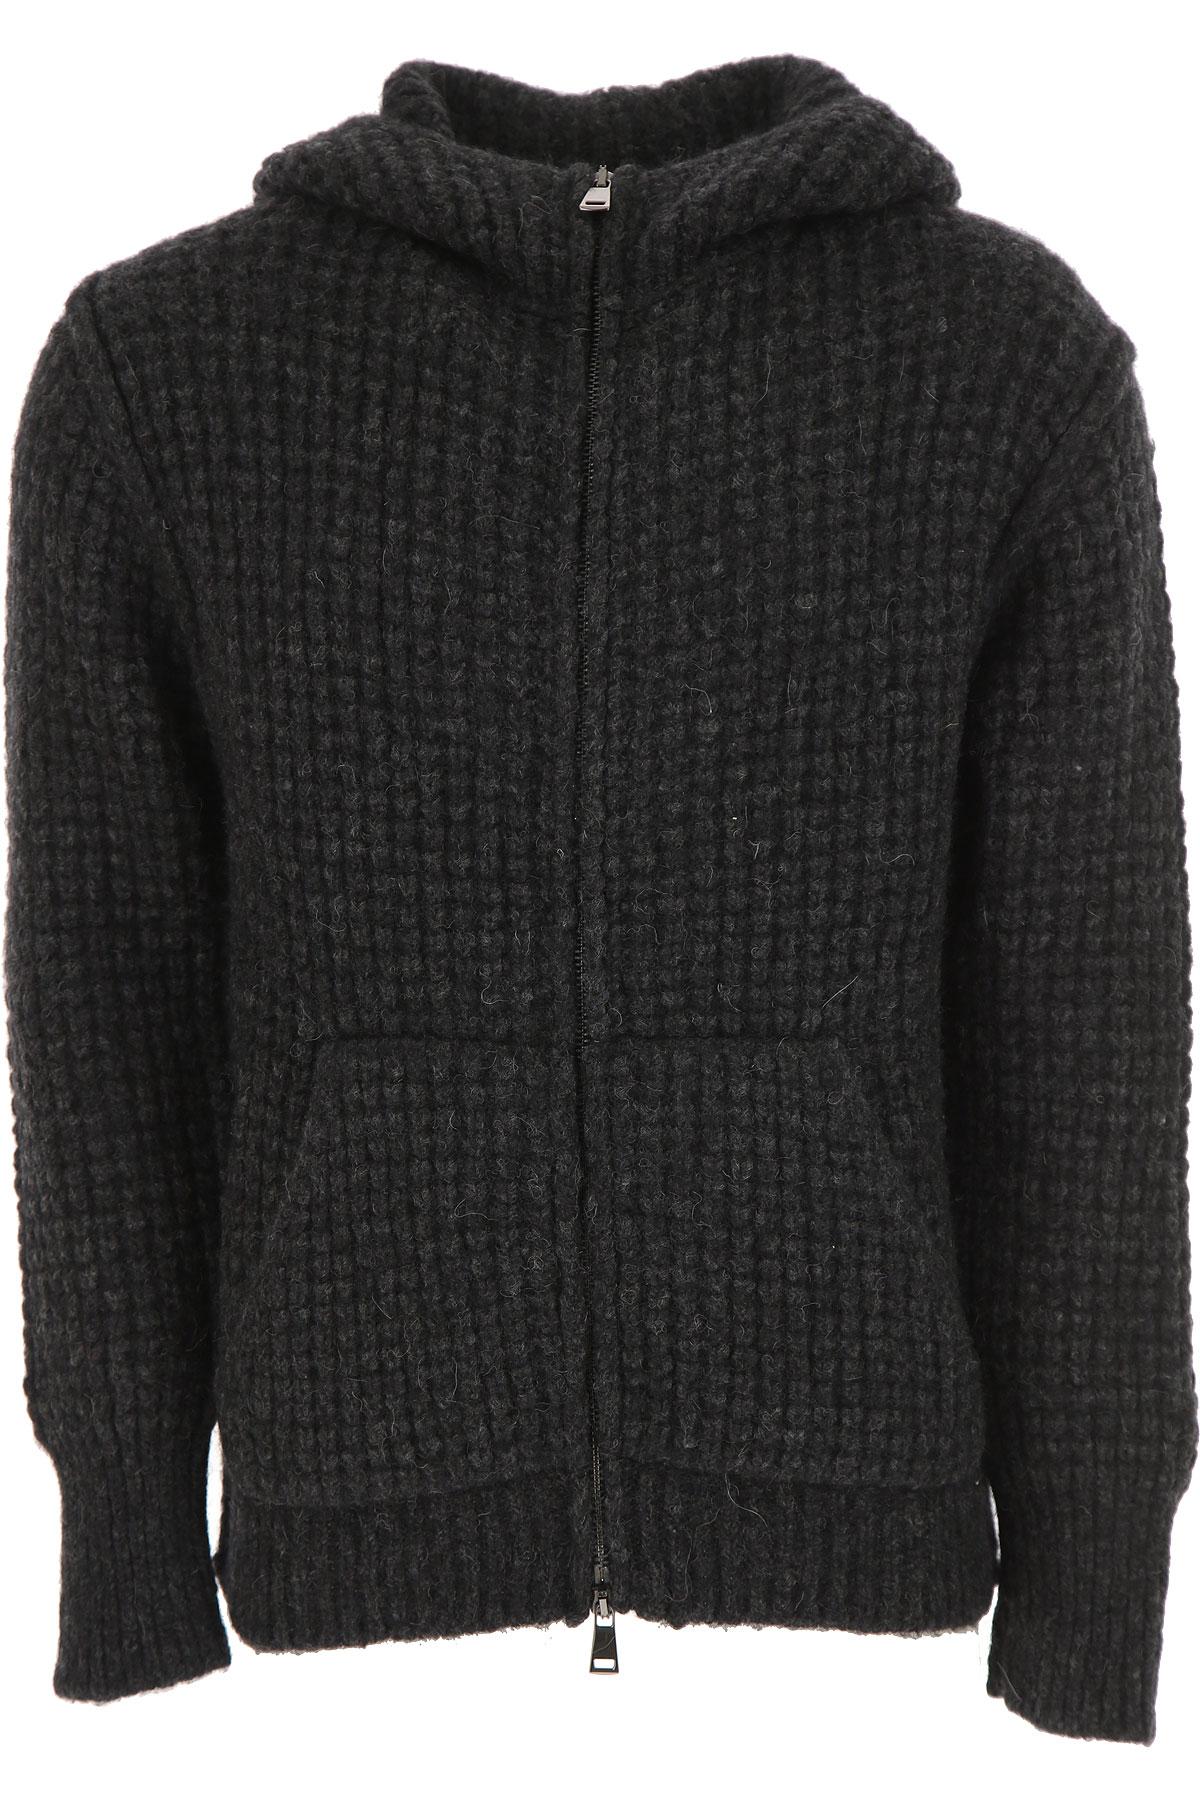 Image of Maison Flaneur Sweater for Men Jumper, antracite, alpaca, 2017, L M XL